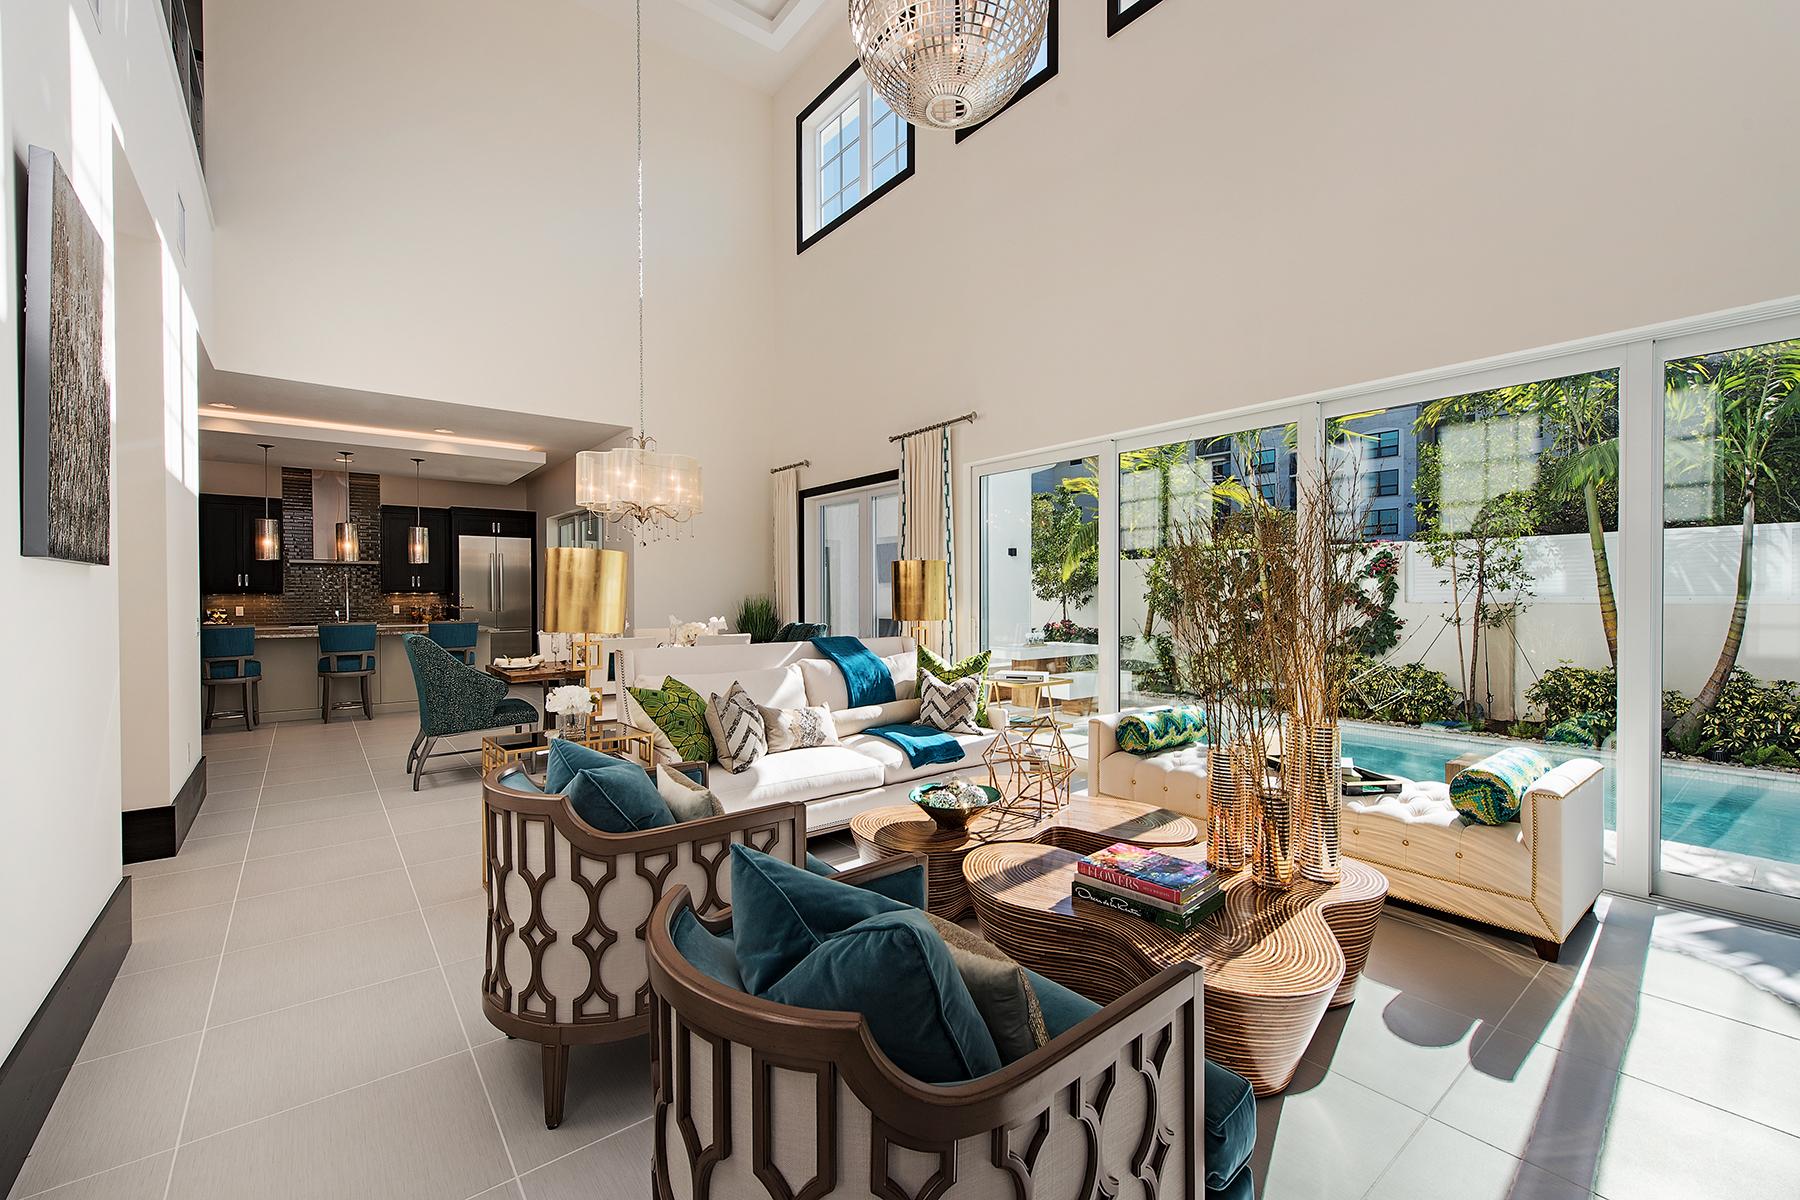 Single Family Home for Sale at Naples 9214 Mercato Way, Naples, Florida 34108 United States